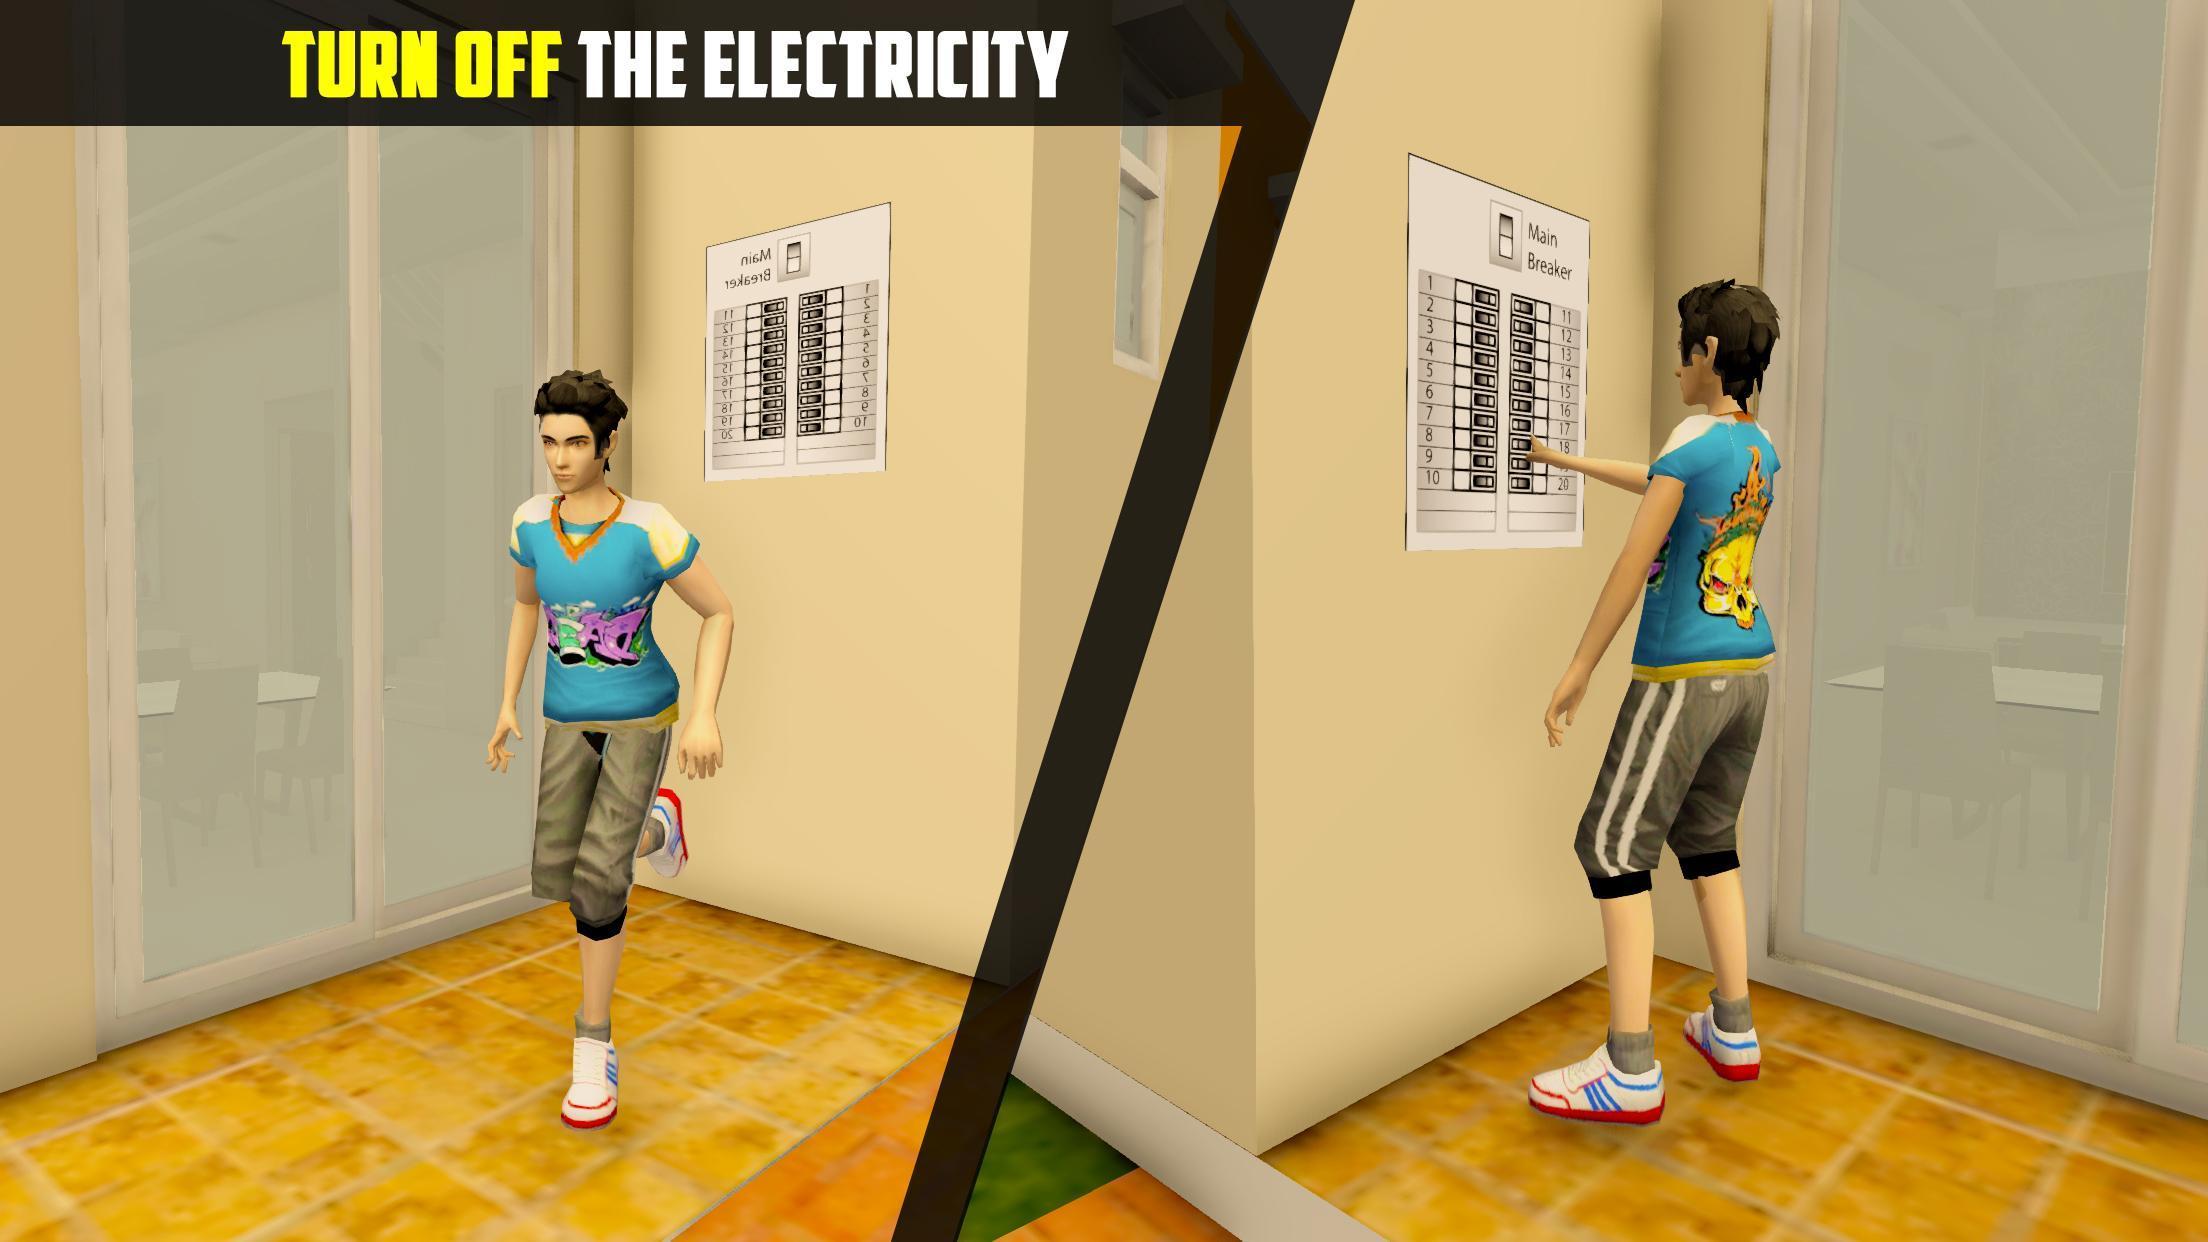 Virtual Bully Boys Next Angry Neighbor 1.4 Screenshot 4